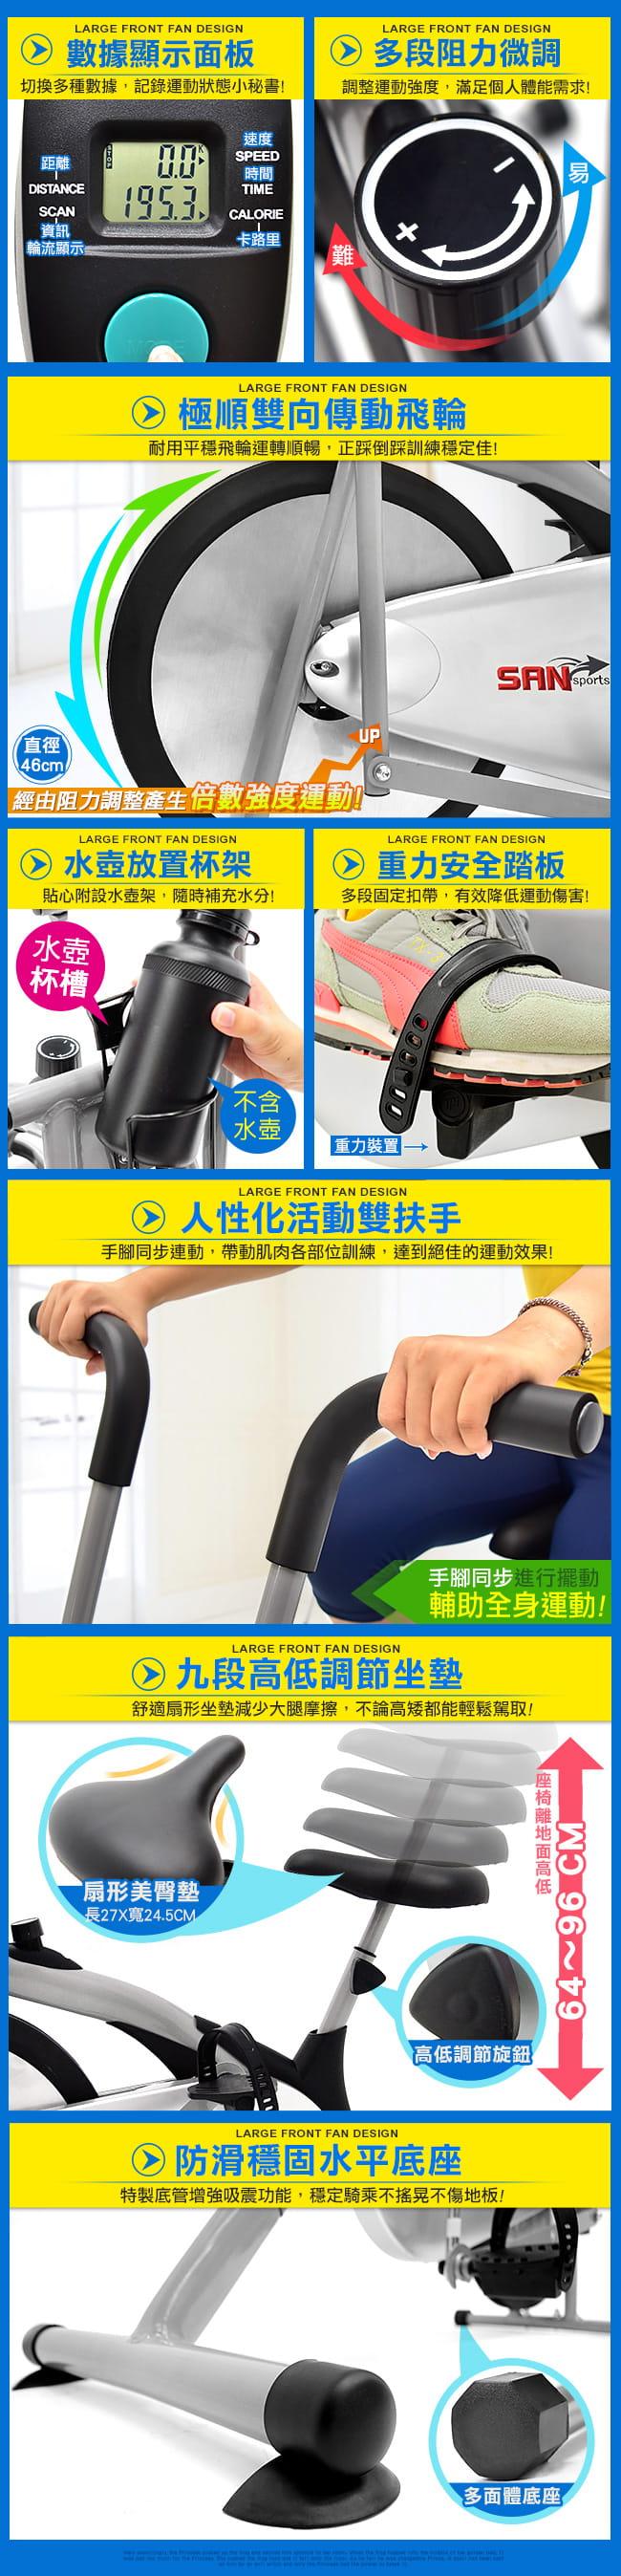 【SAN SPORTS】手腳並用手足健身車    室內腳踏車 5